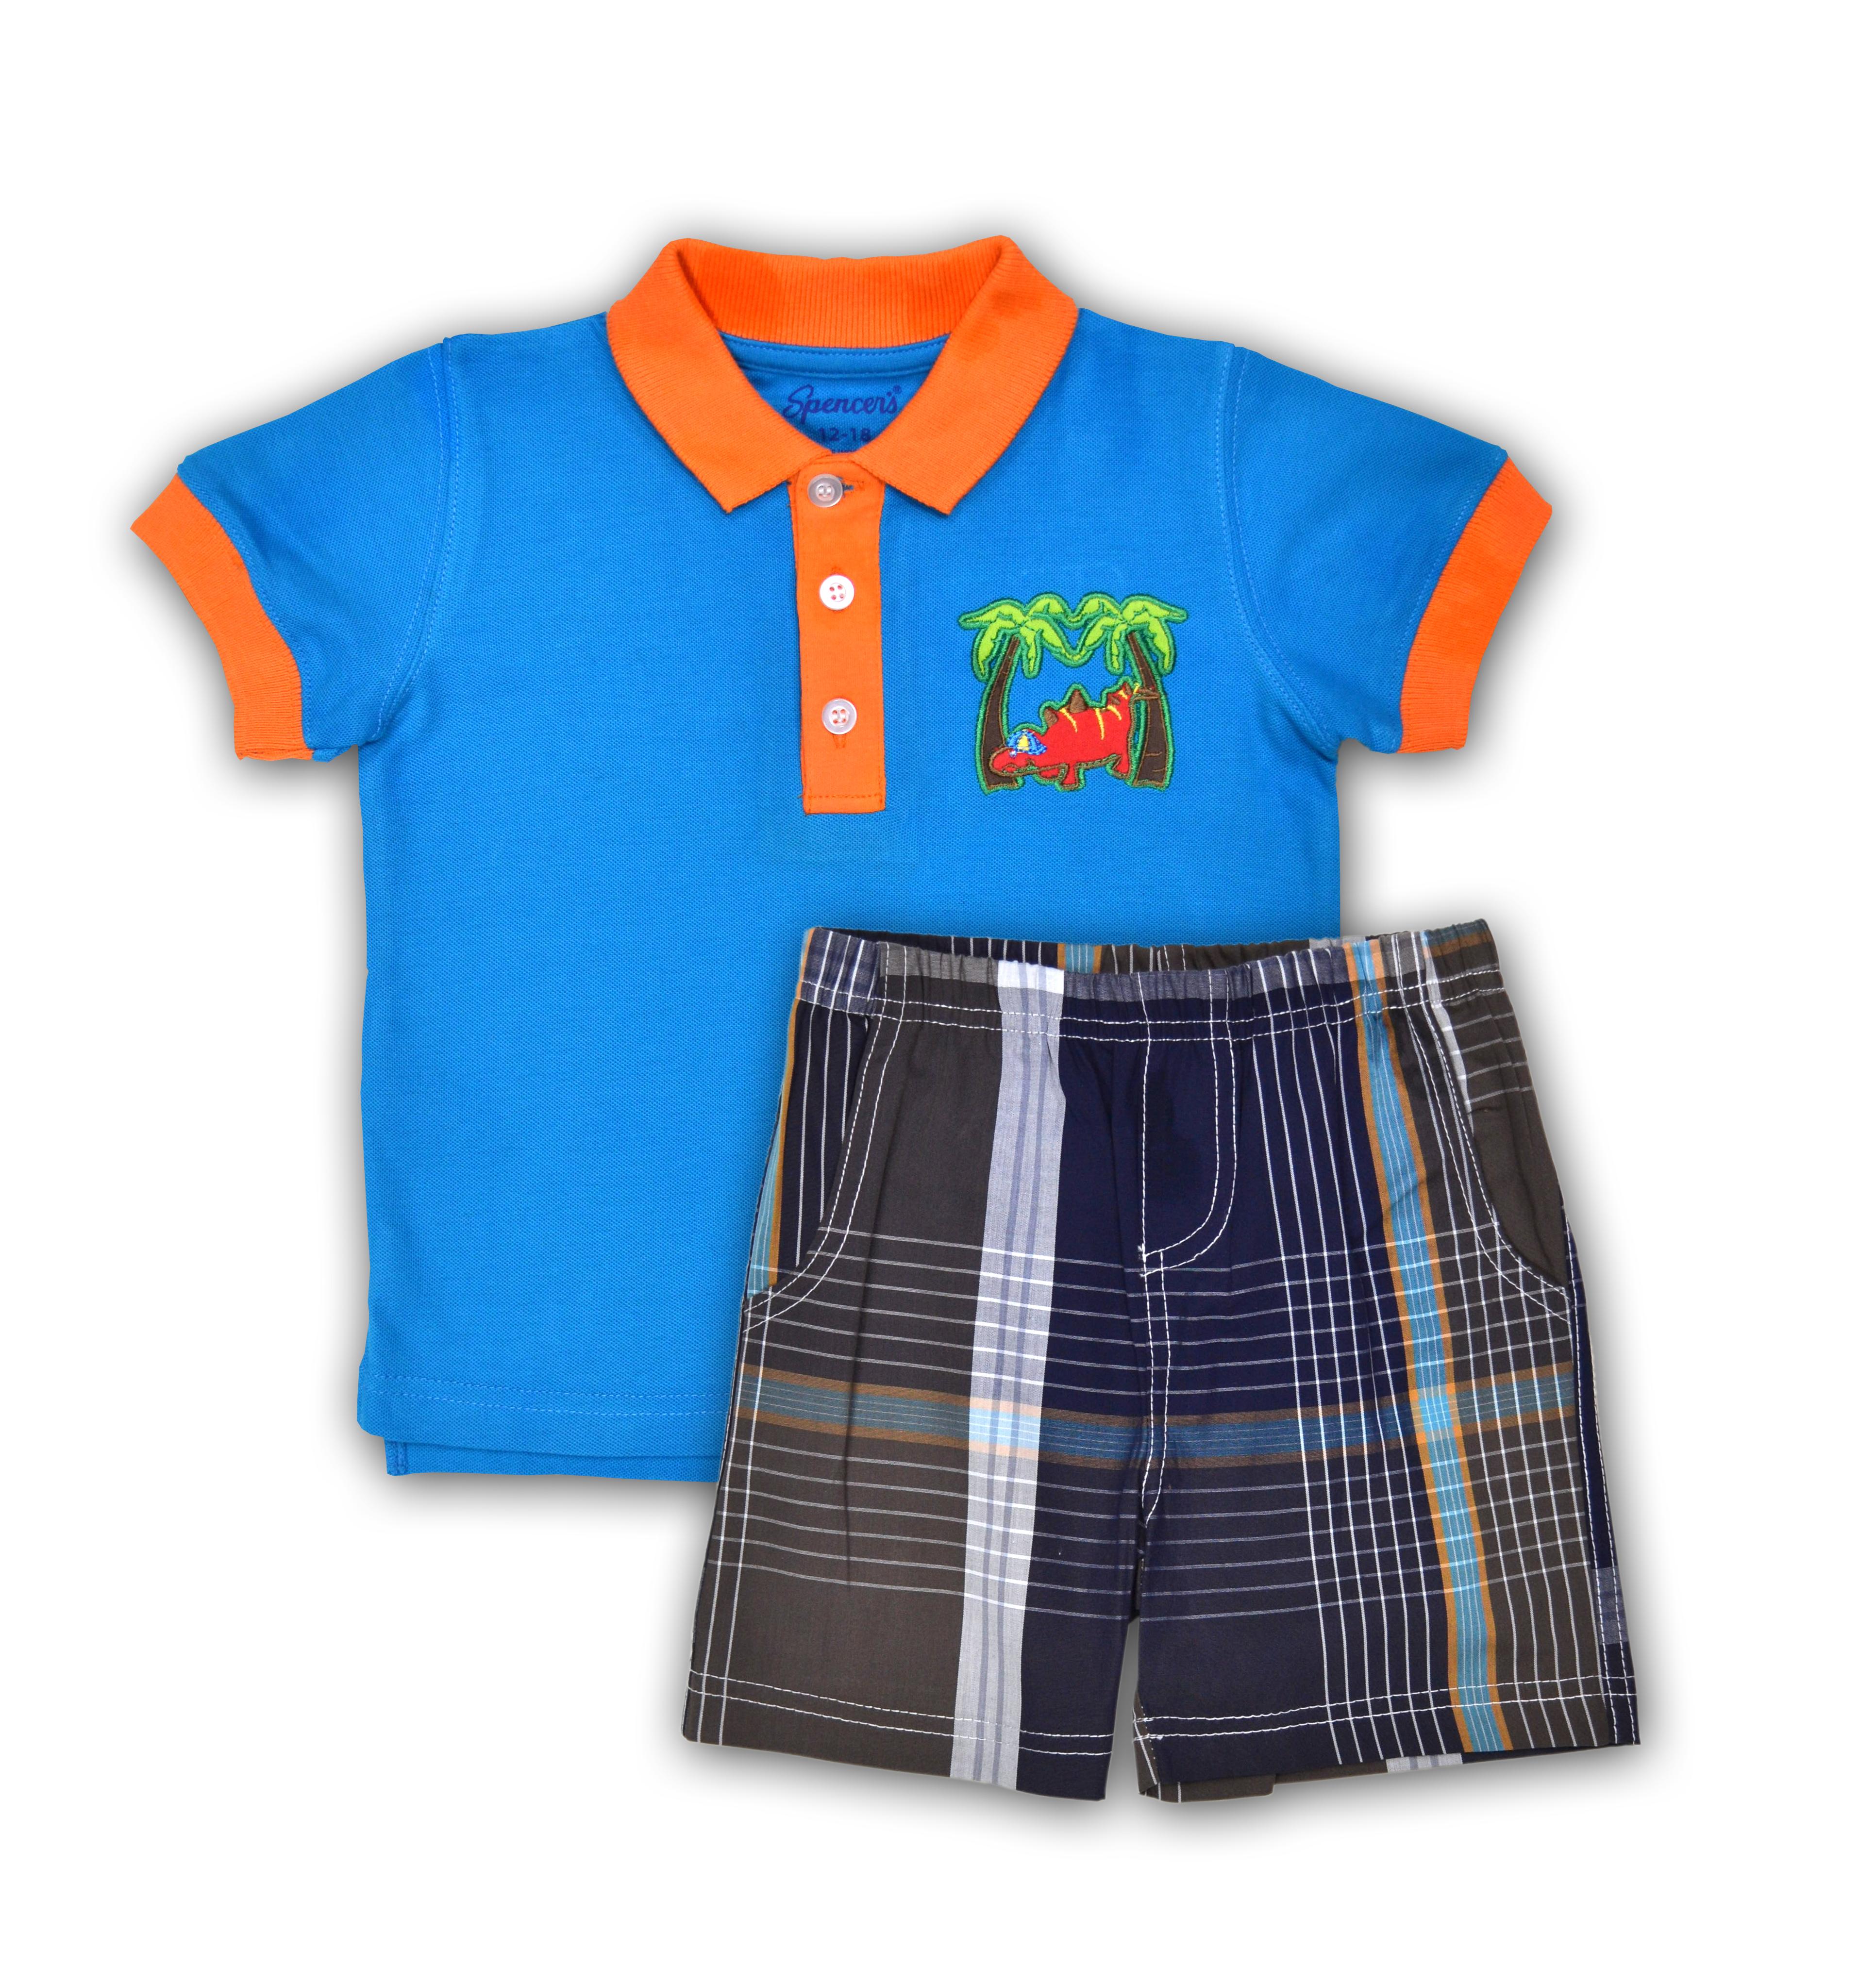 Blue+Polo-Short+Set.jpg